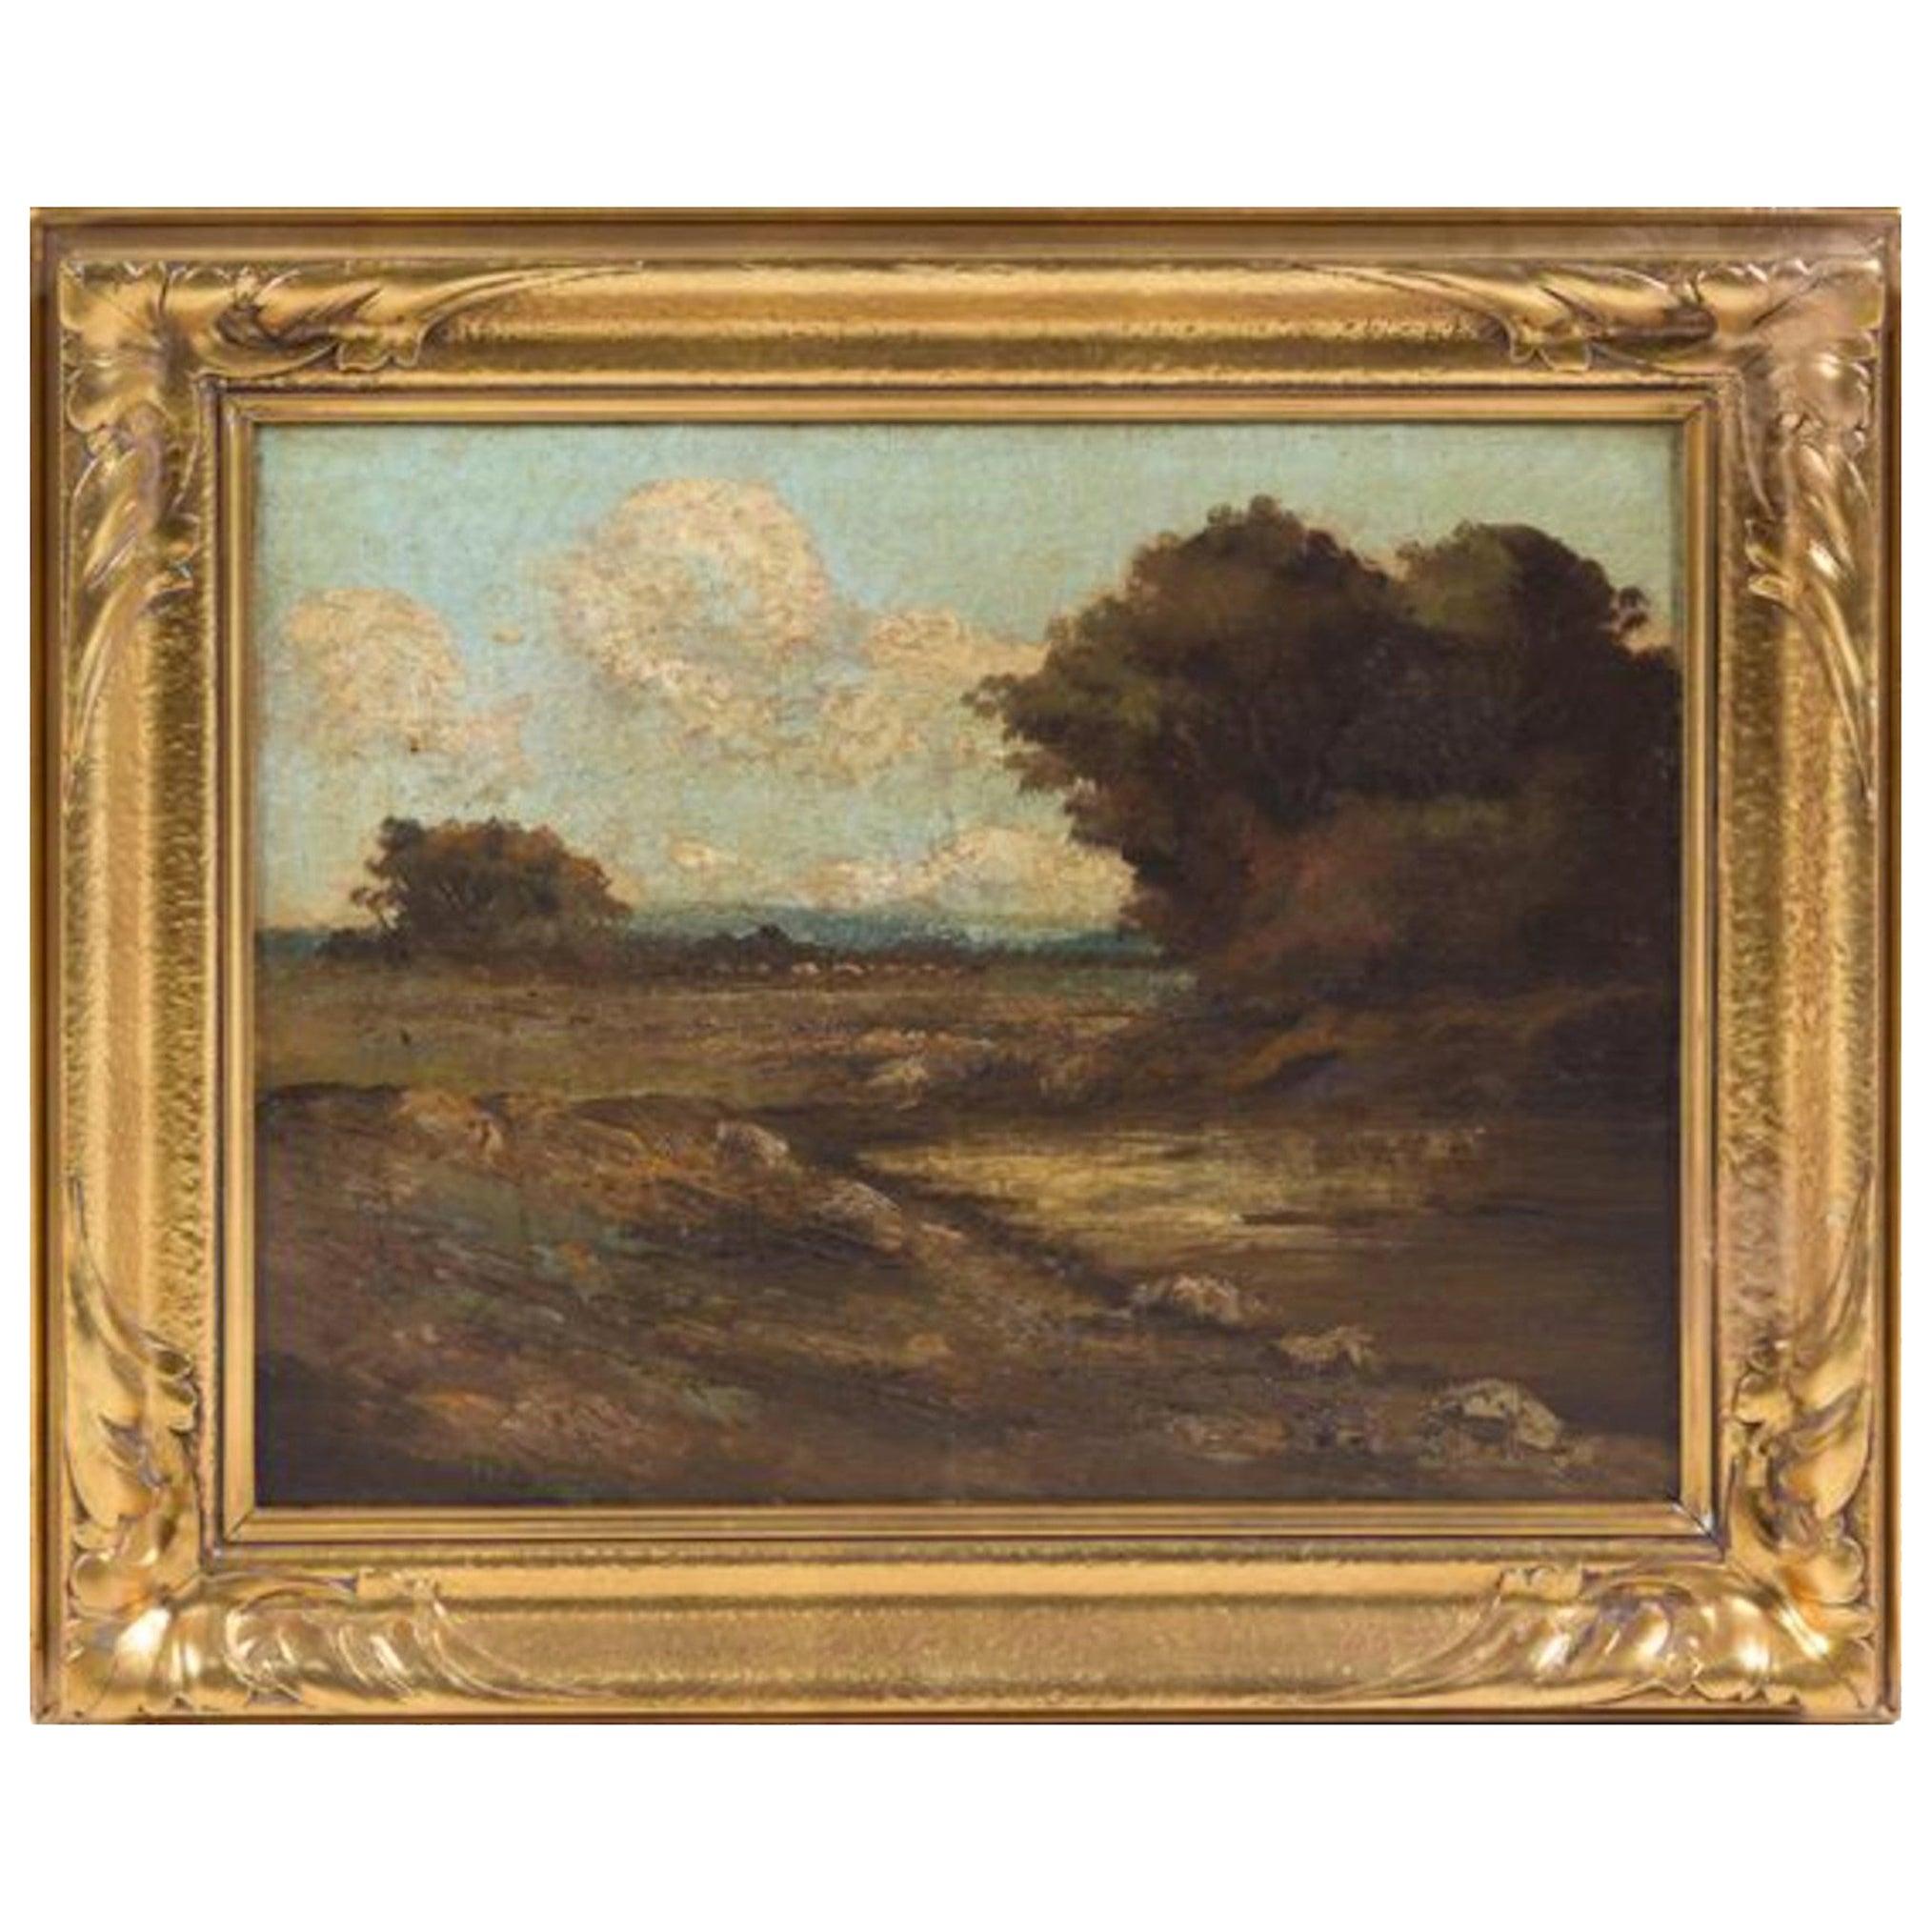 Barbizon School, 19th Century Forest Landscapes Oil on Canvas